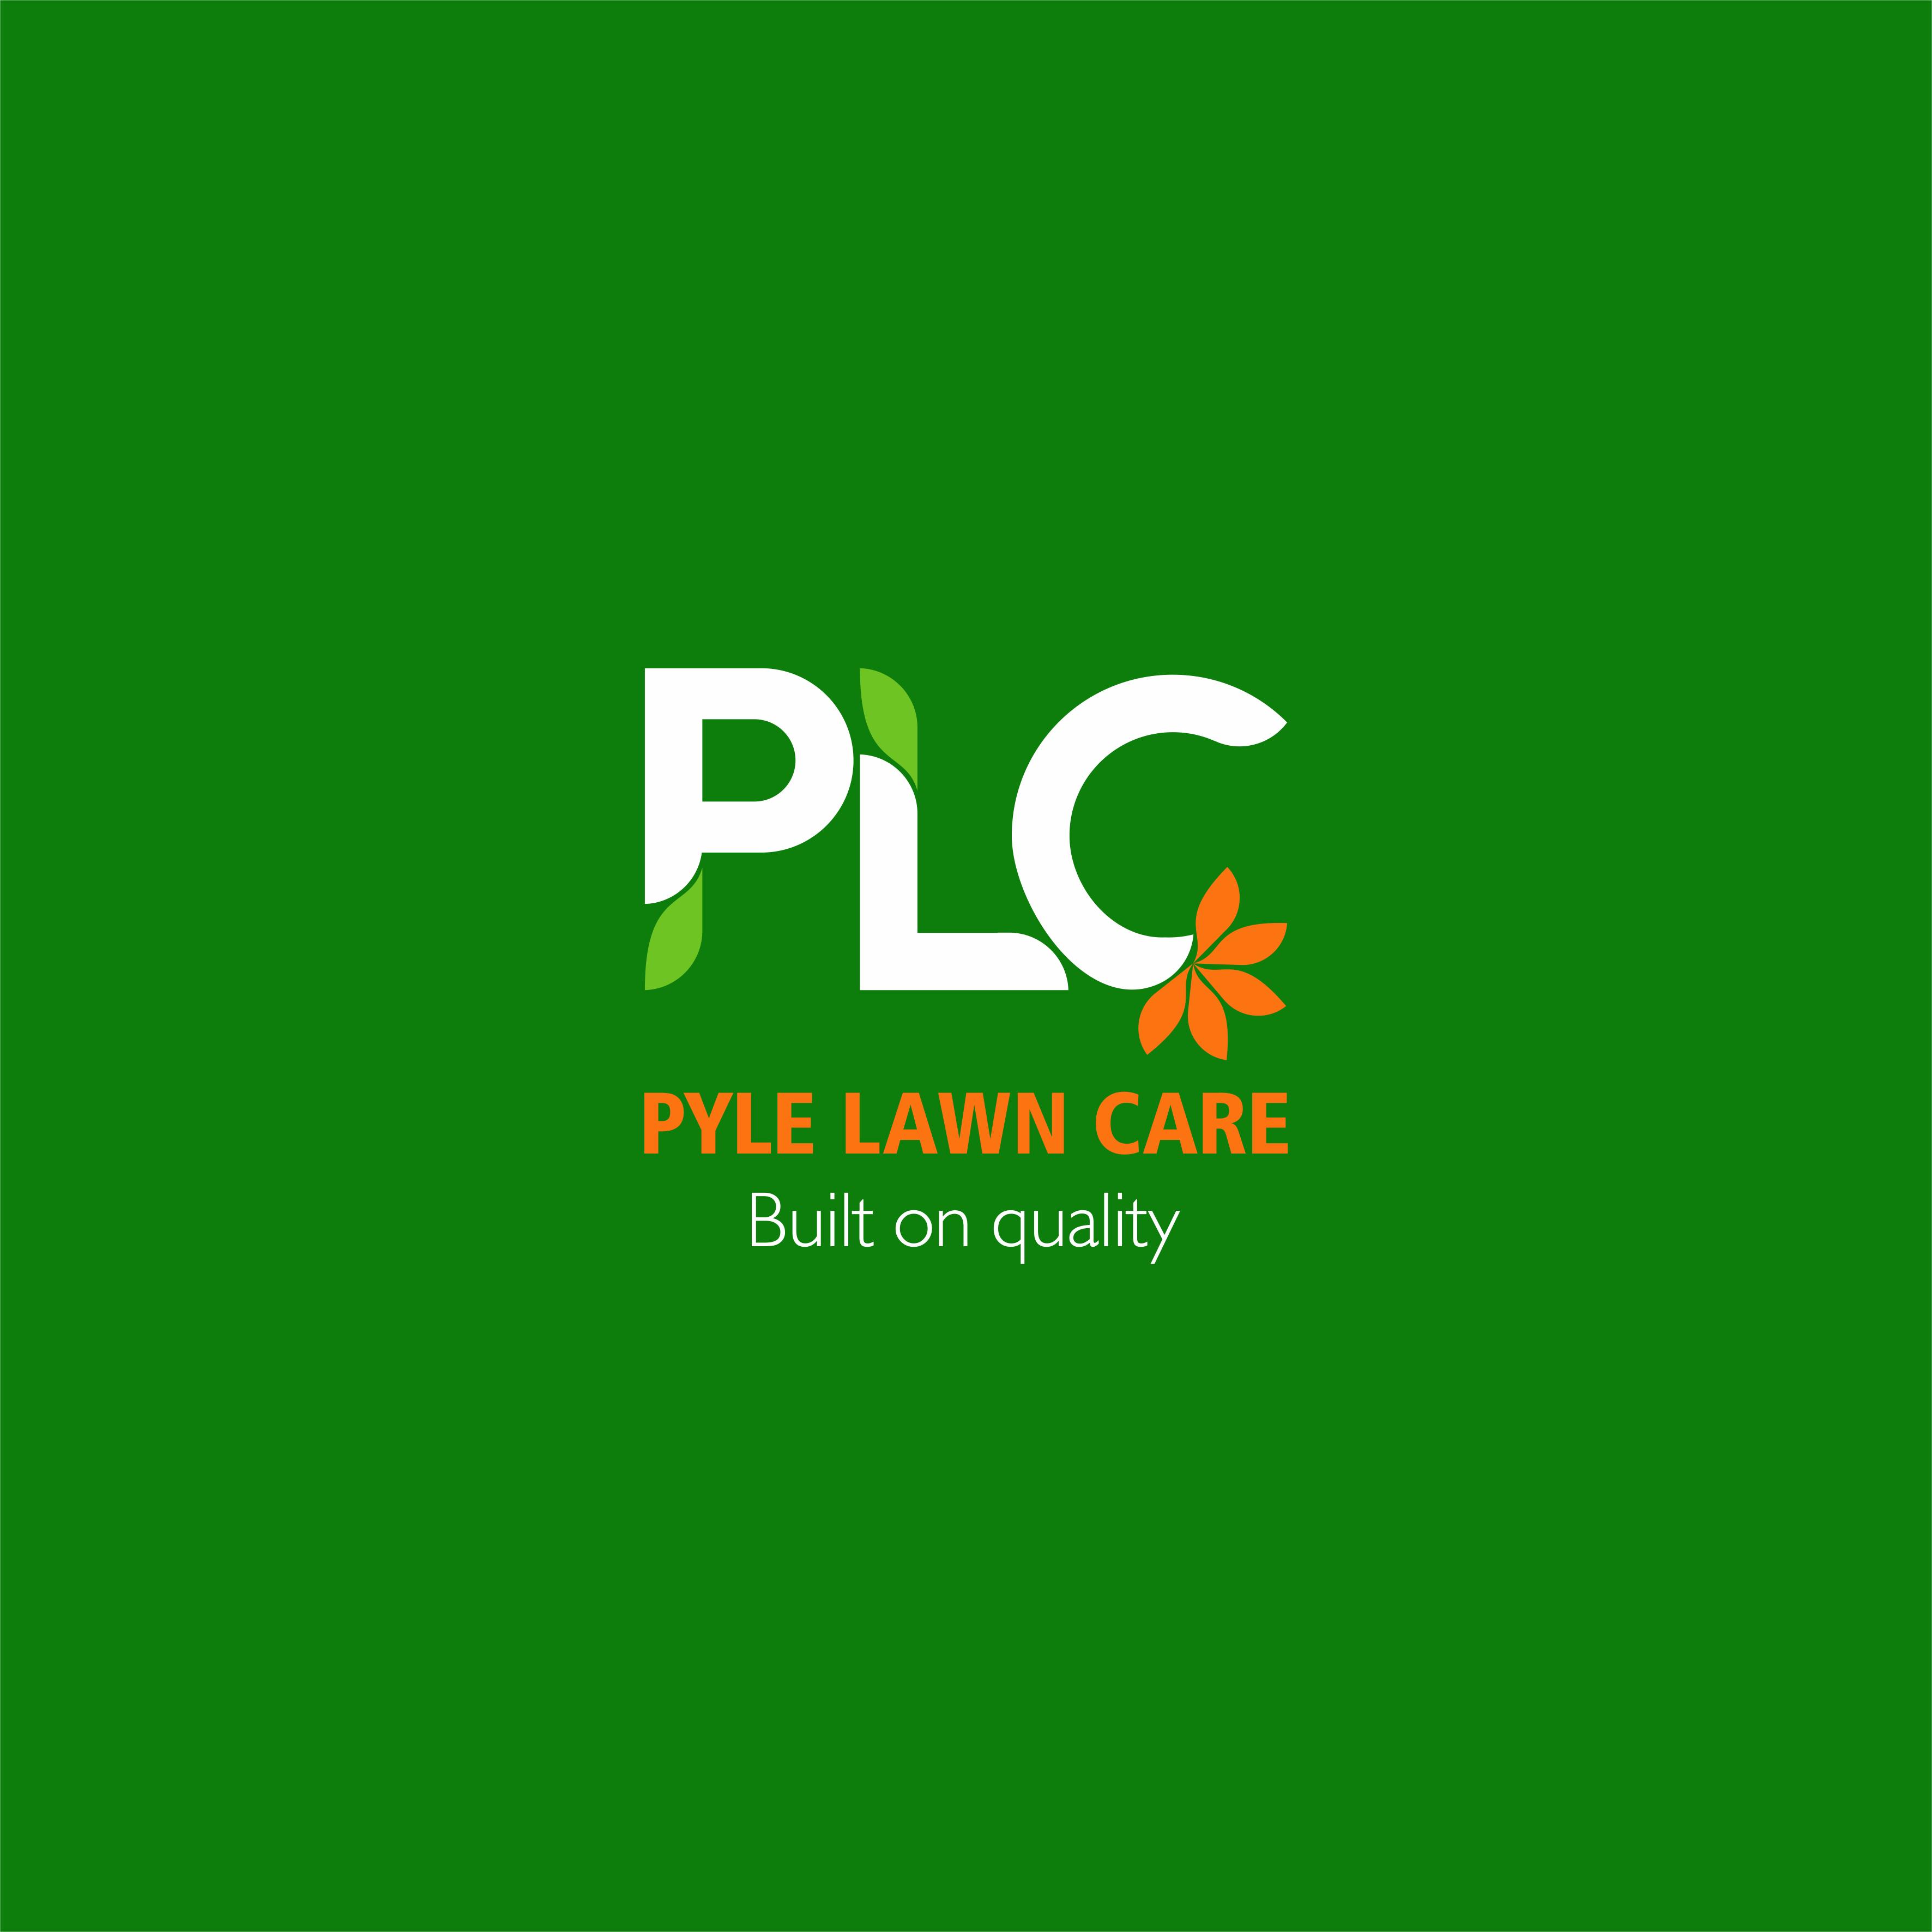 Pyle Lawn Care